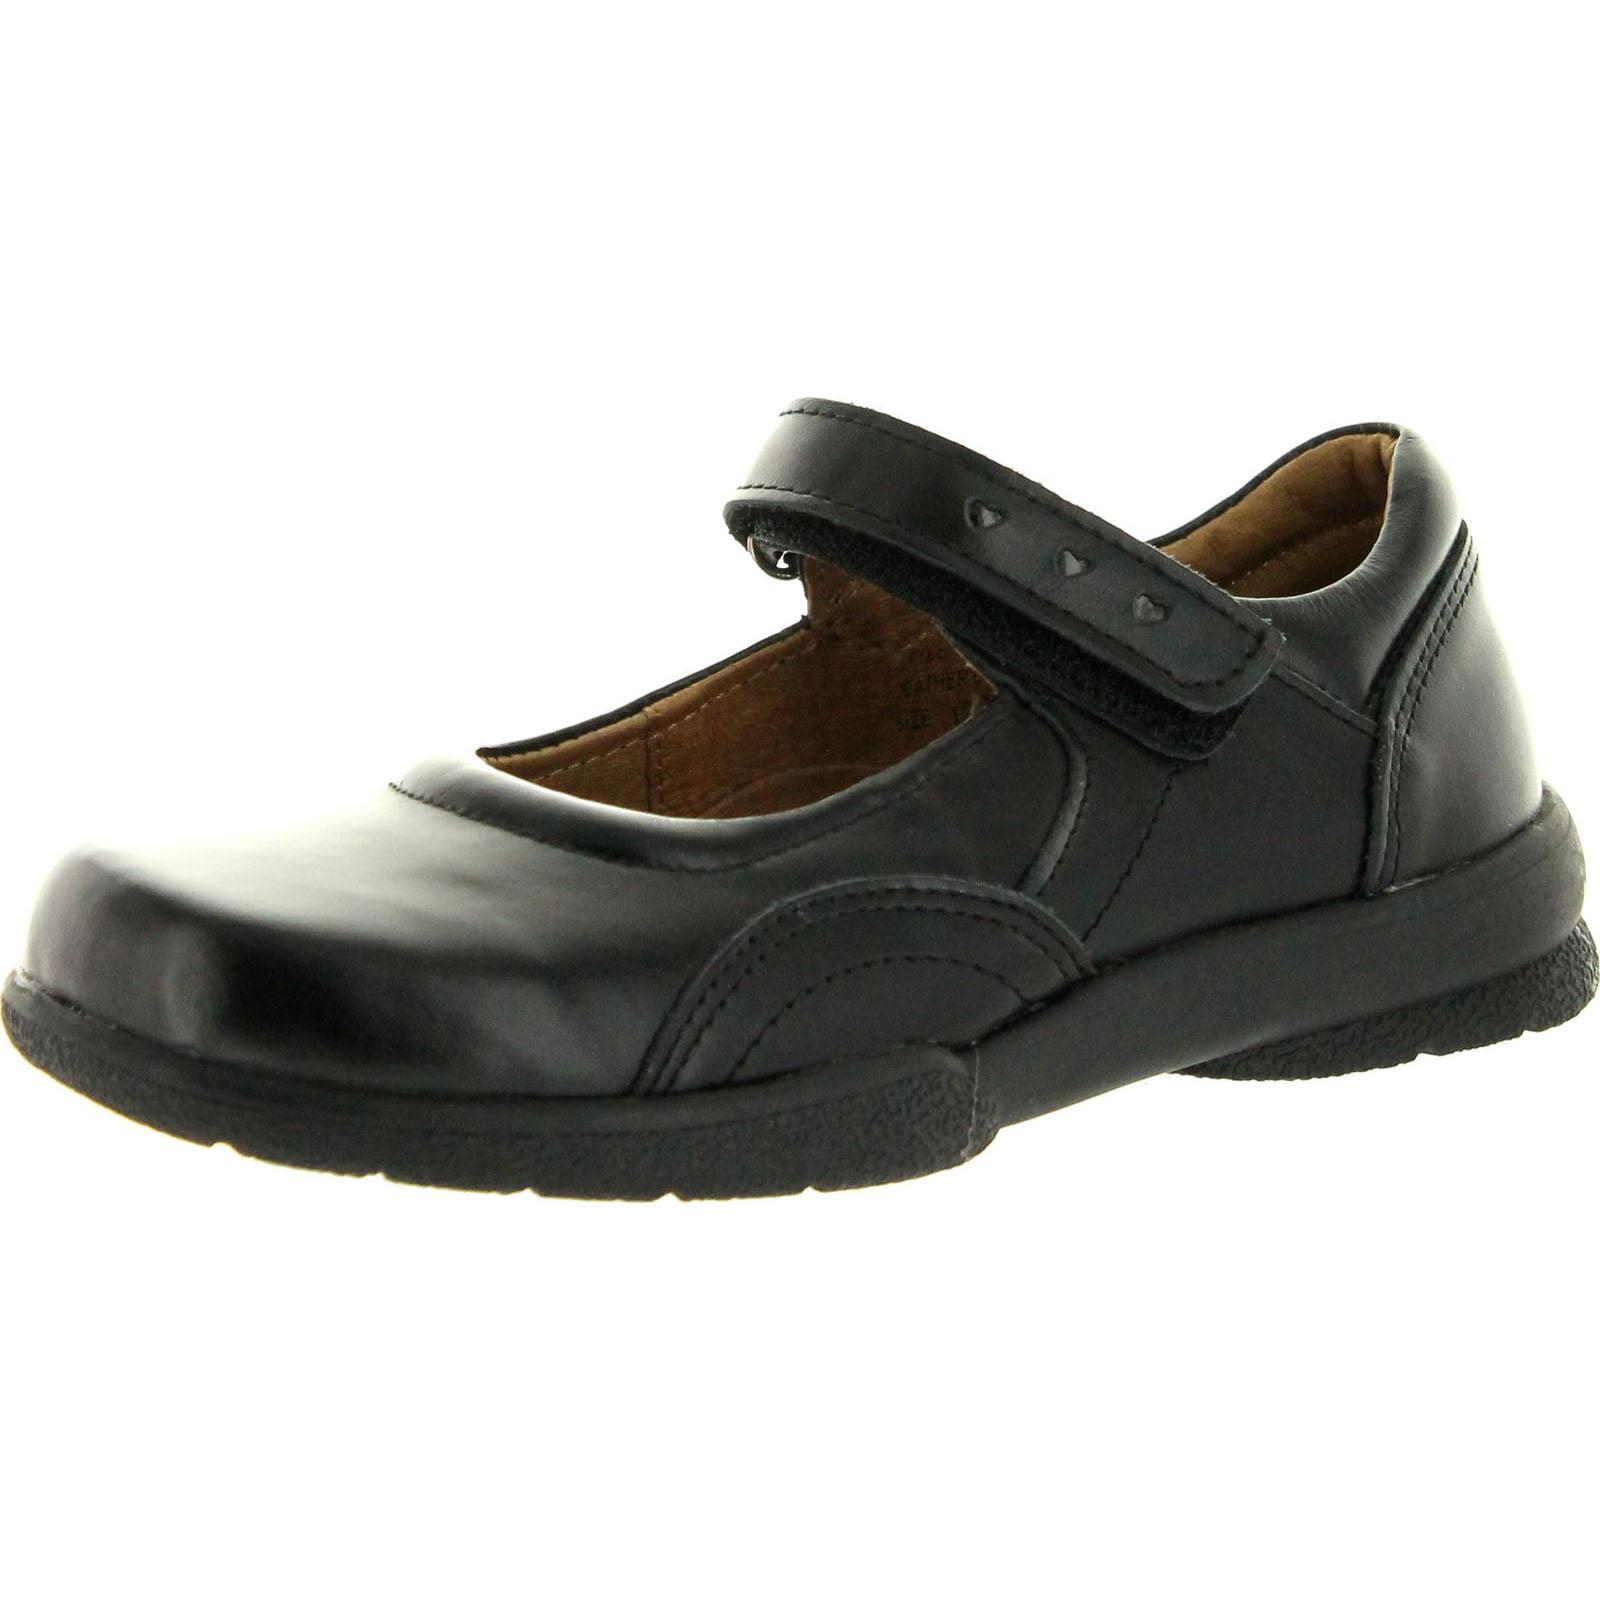 Angels Girls Flats Casual Mary Jane Flats Girls Shoes, Black., 13.5 a29b99